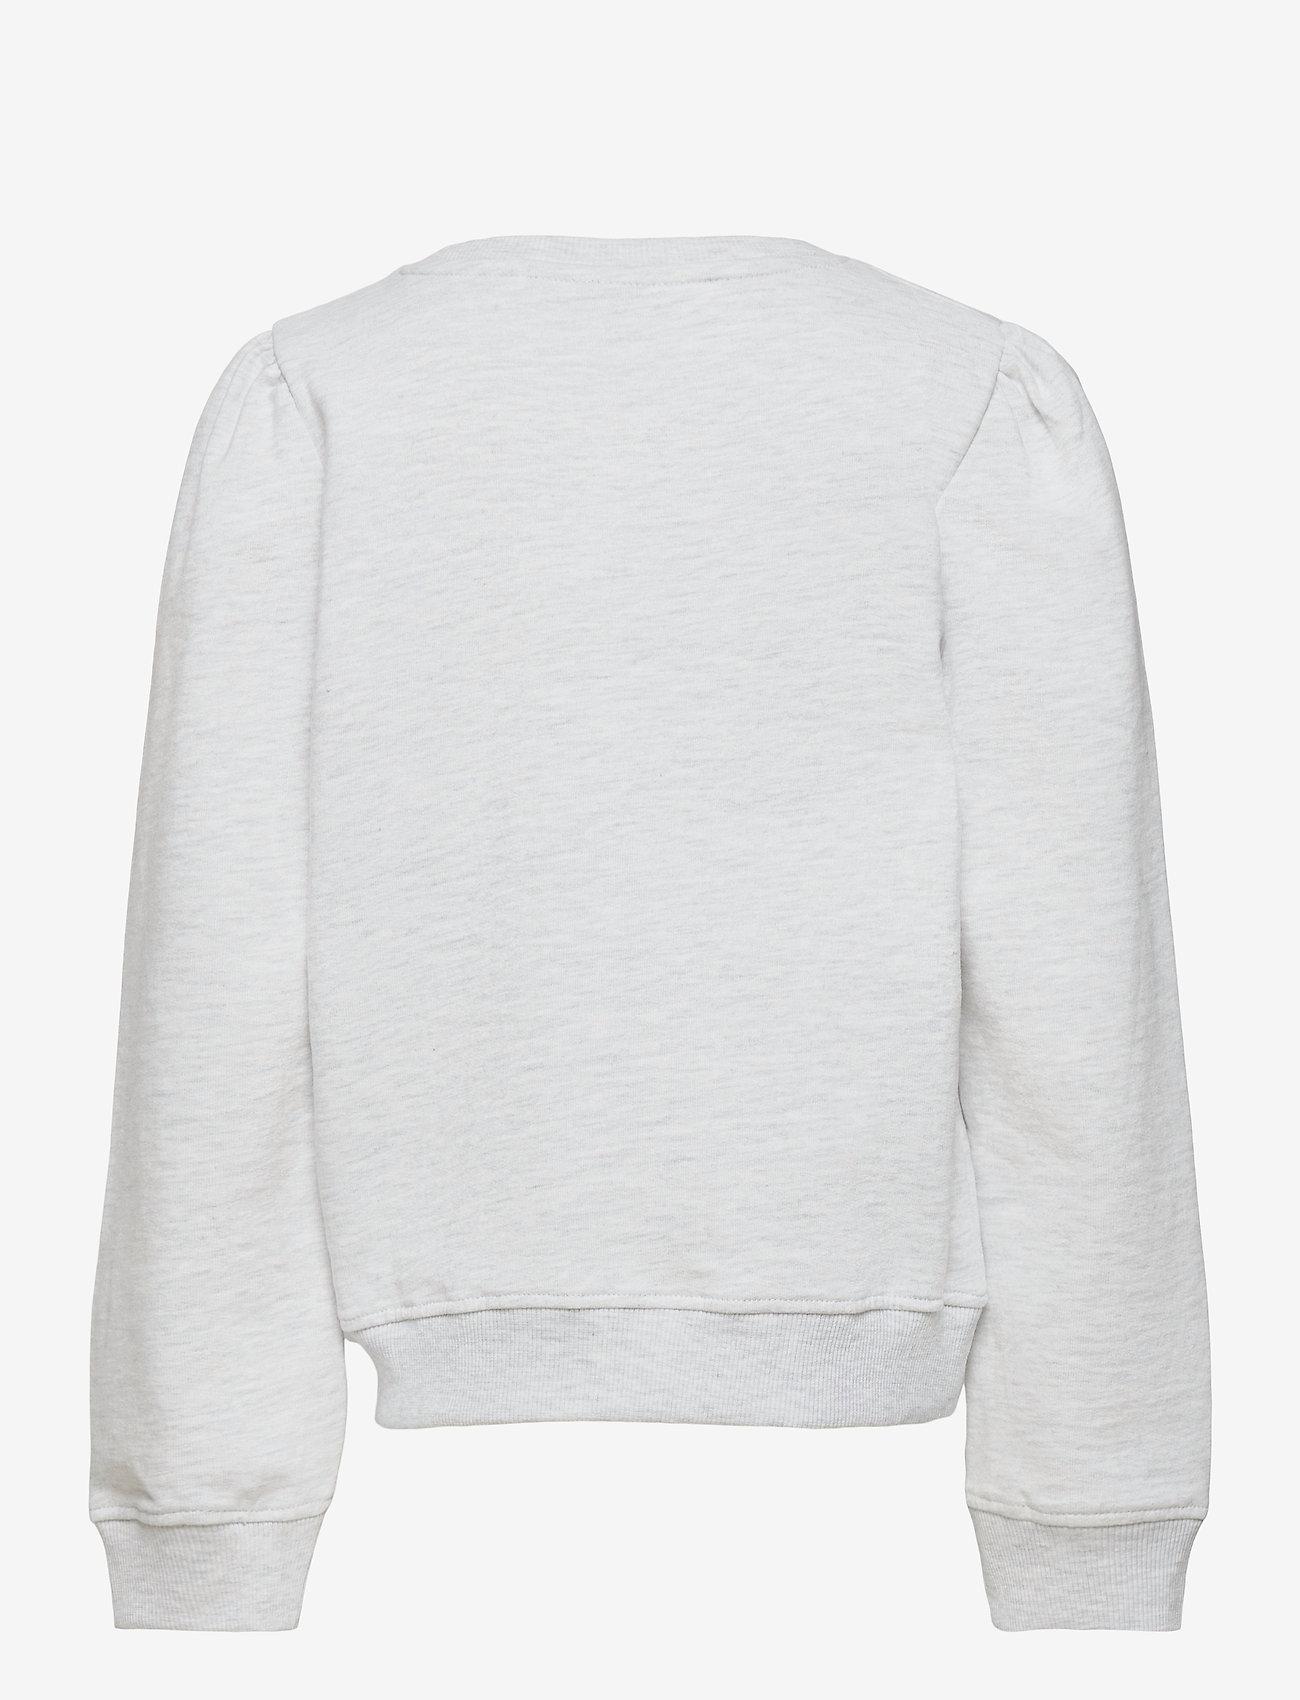 LMTD - NLFFATIAN LS SHORT SWEAT - sweatshirts - oatmeal - 1